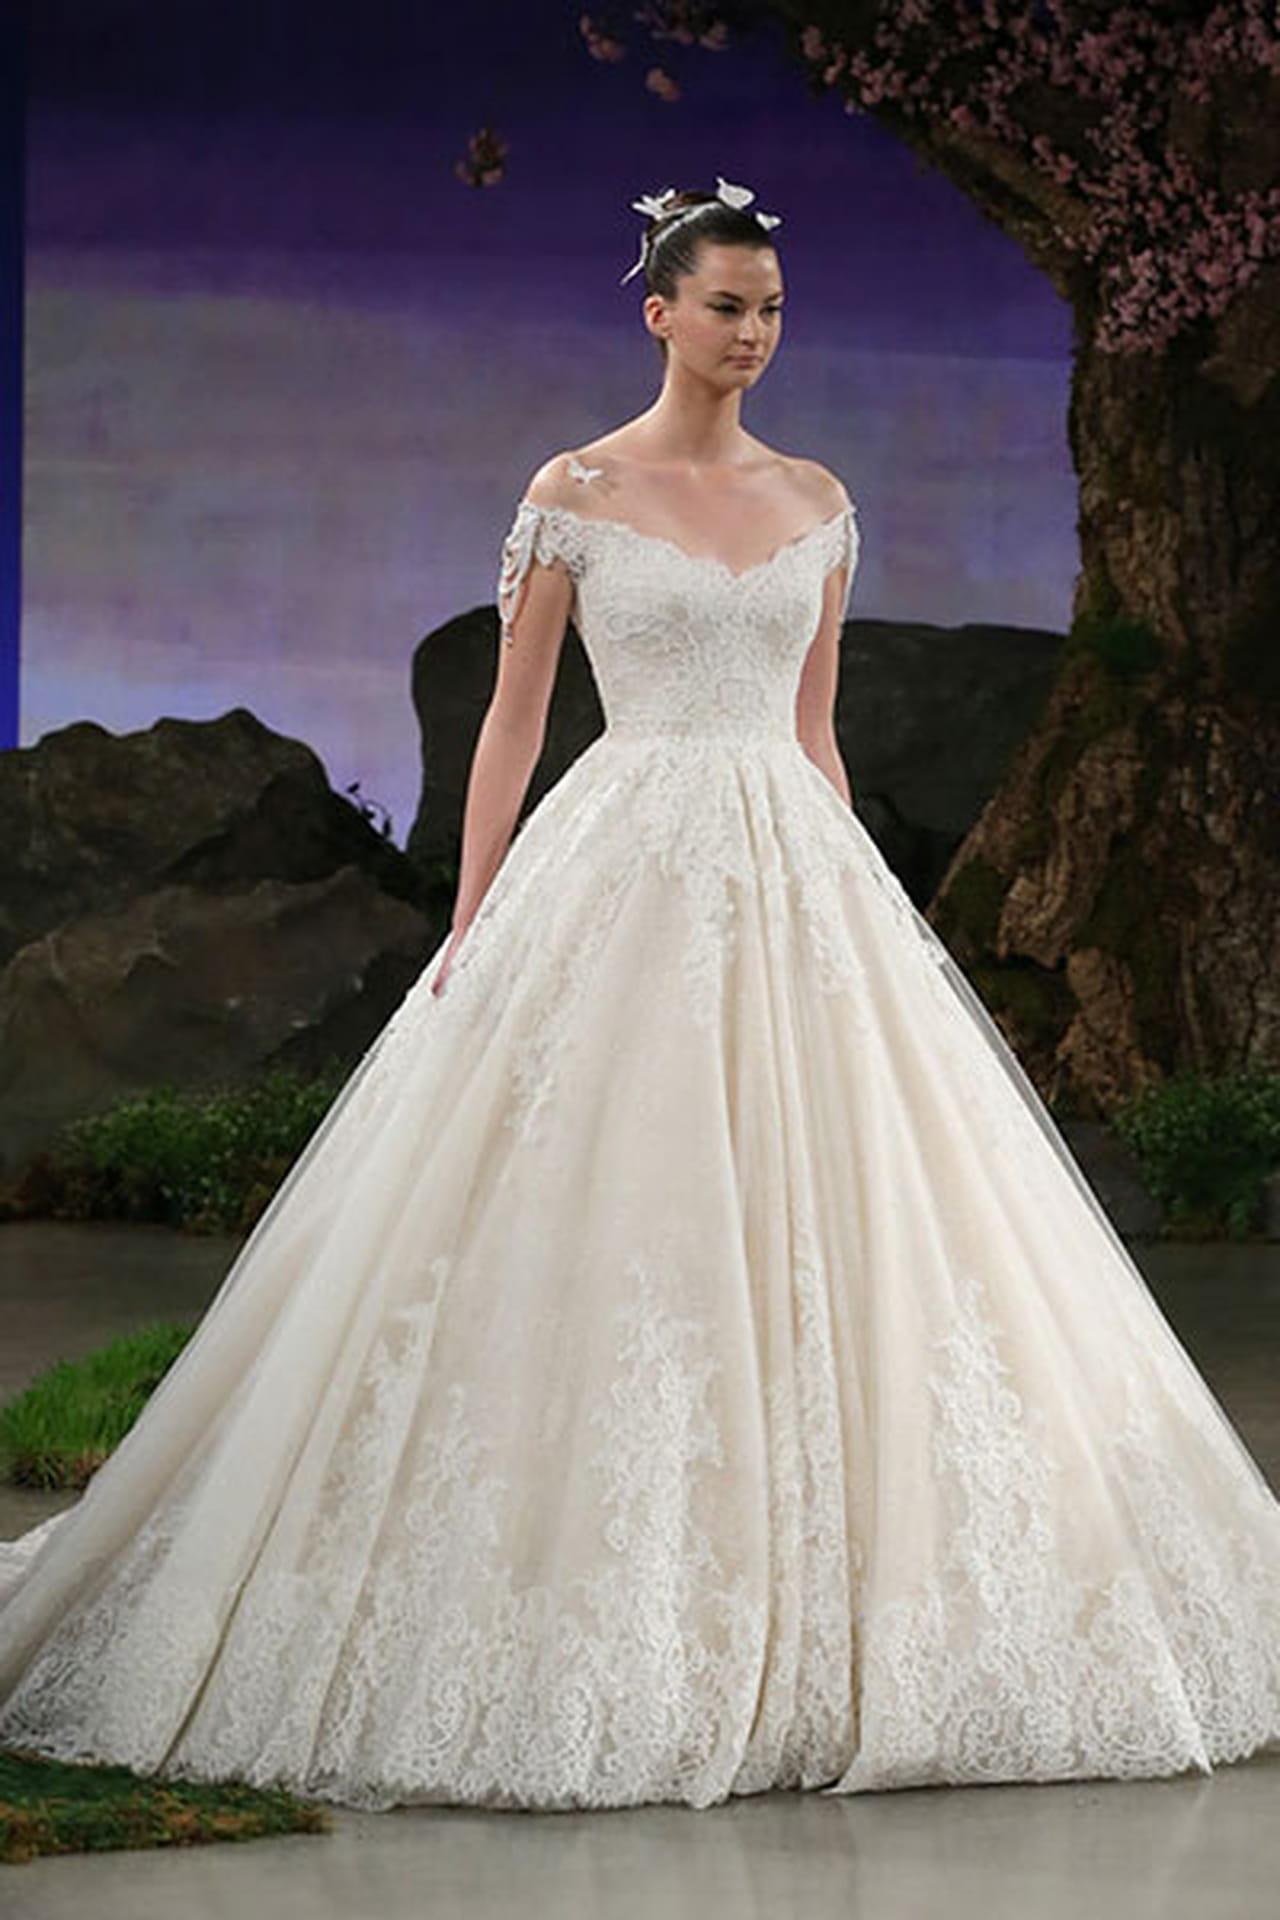 اجمل تصاميم من فساتين اعراس 2016